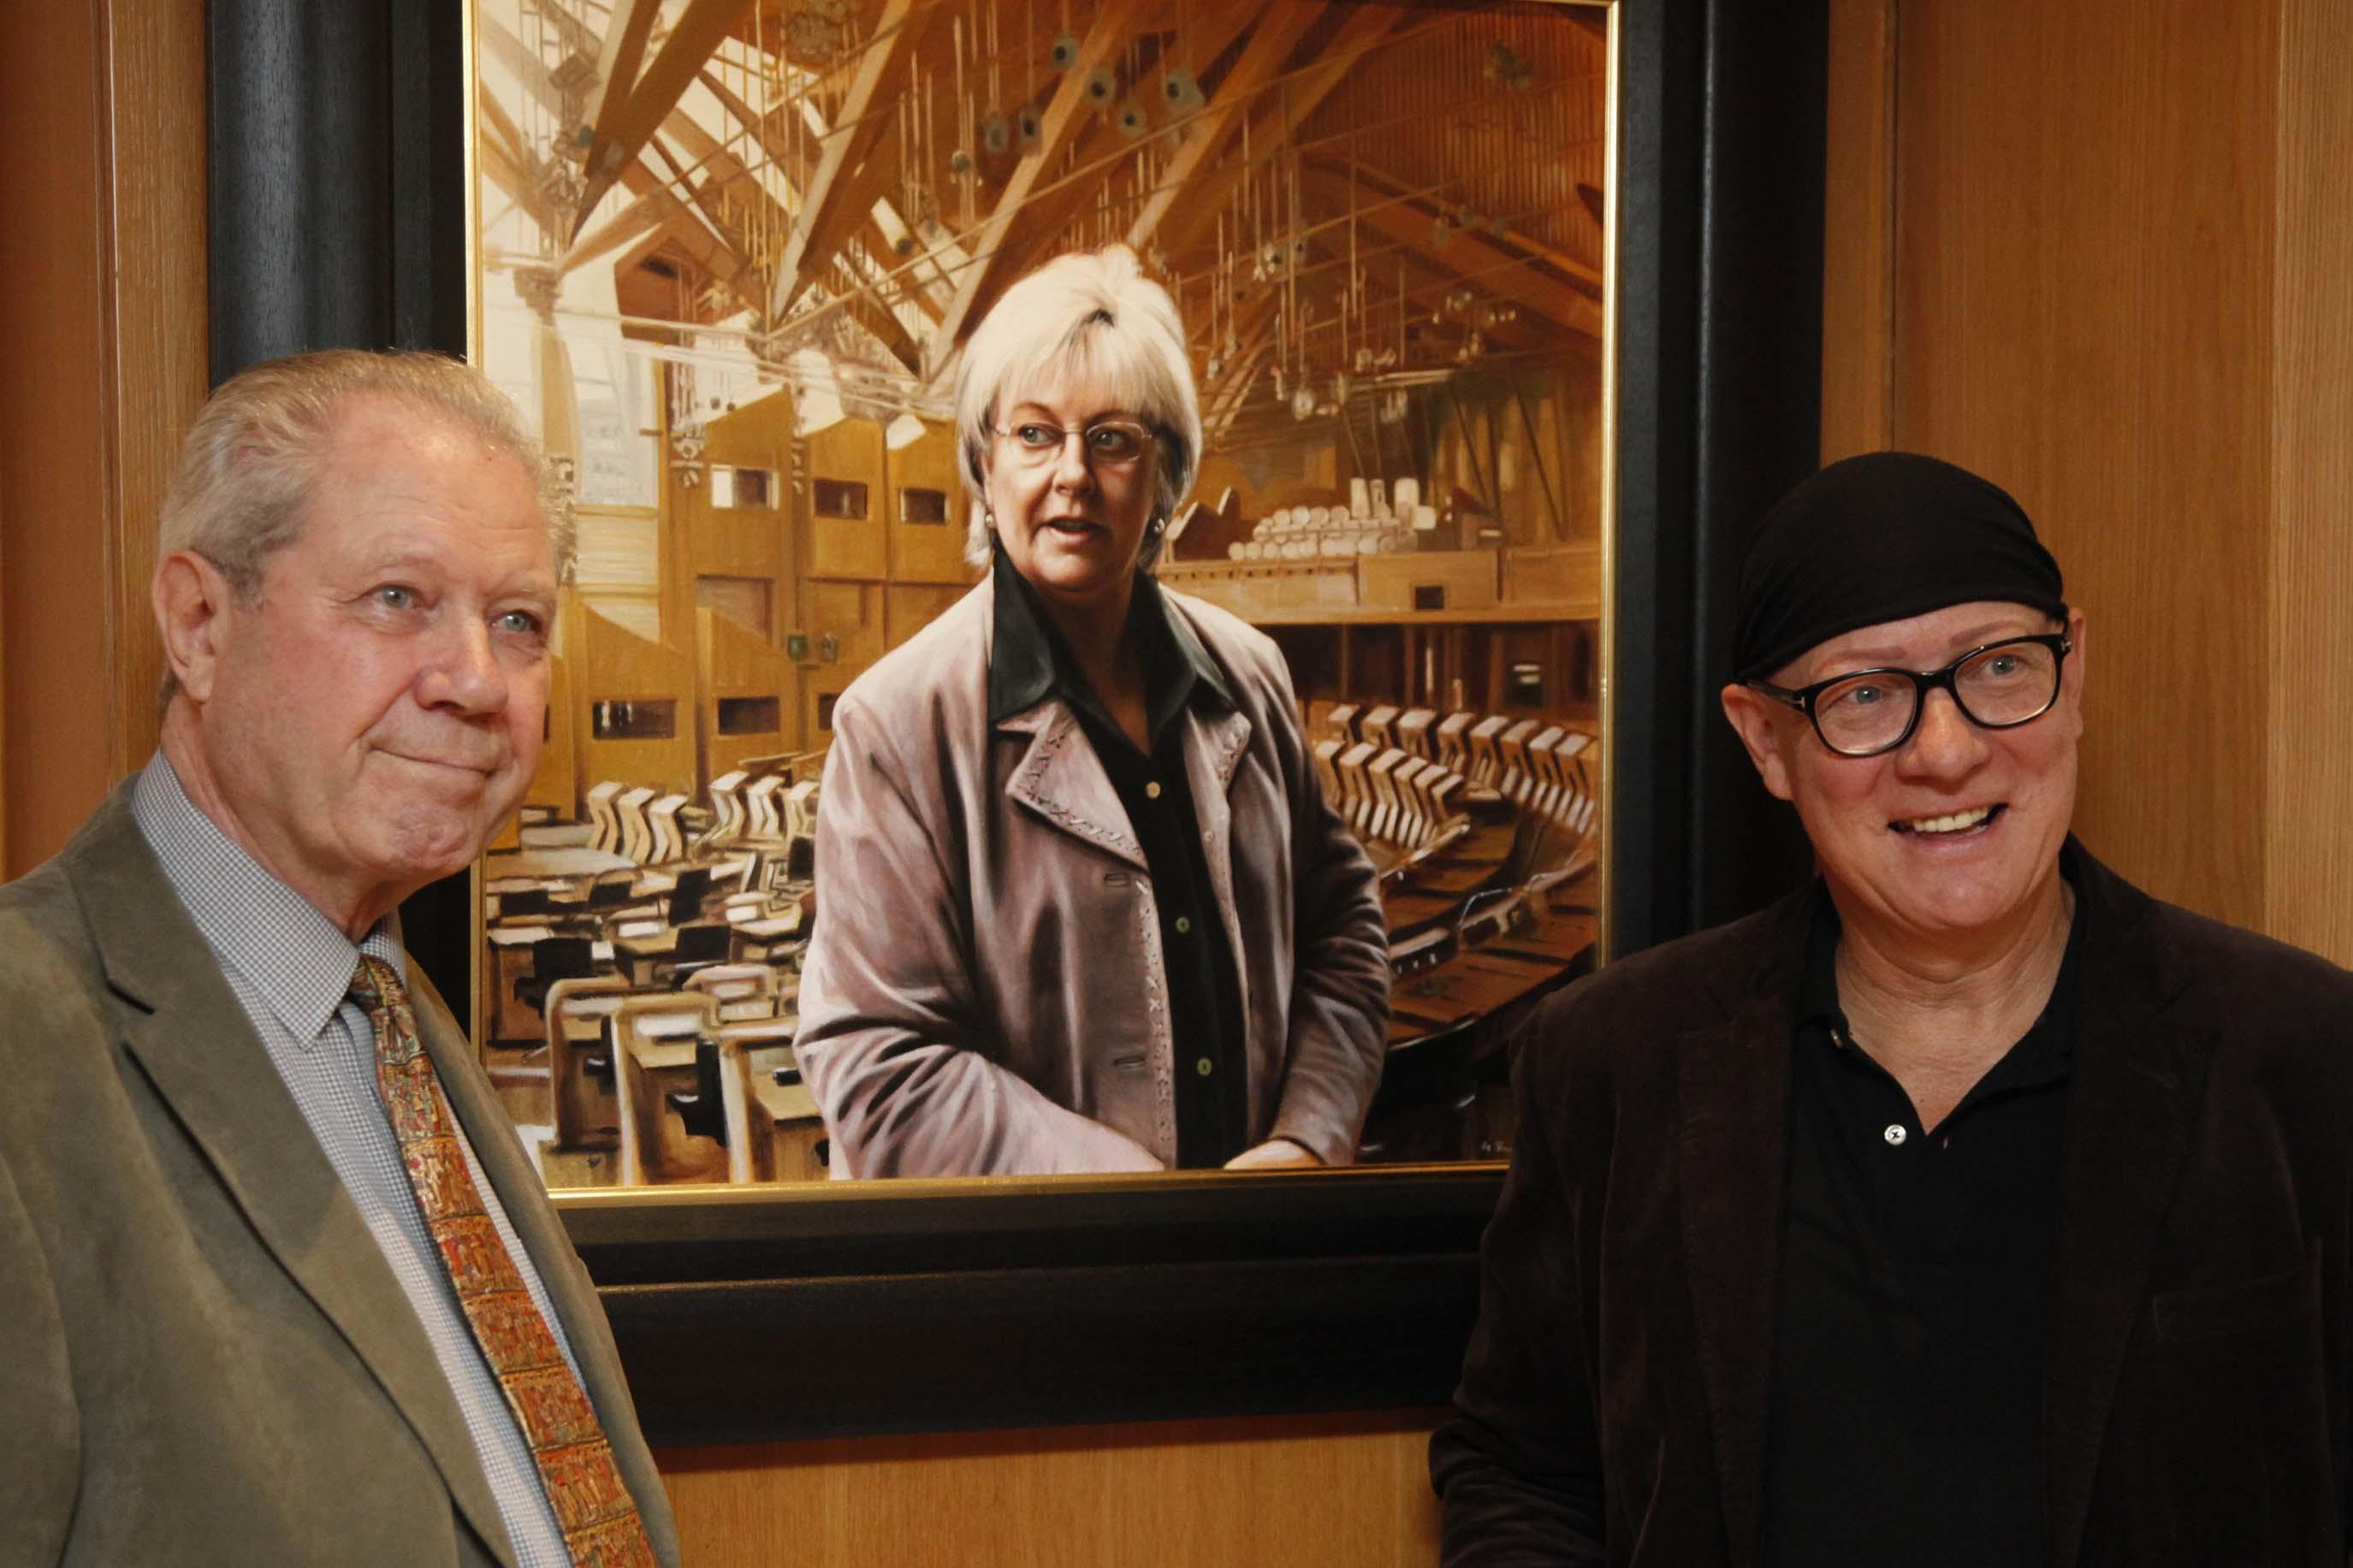 Artist Gerard Burns (right) with Margo MacDonald''s husband Jim Sillars.